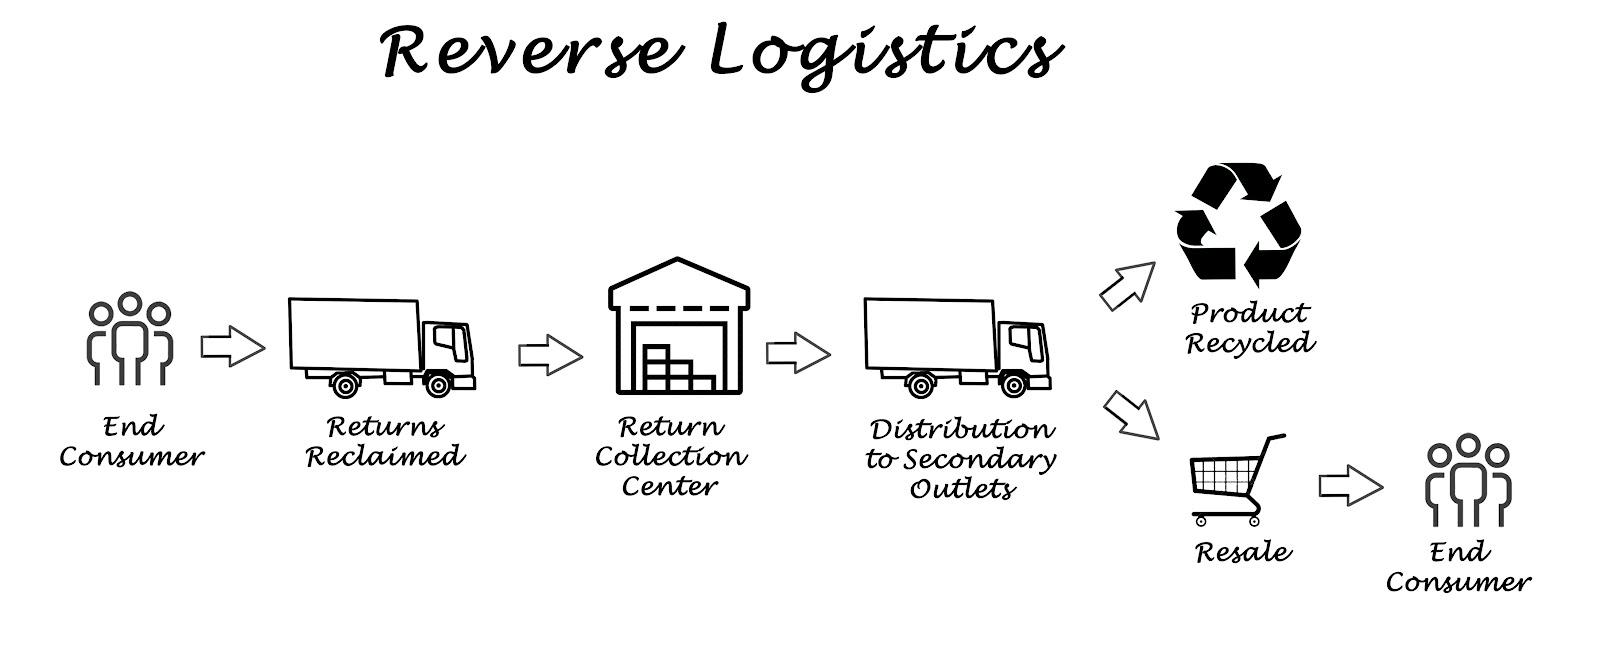 reverse logistics in pharma industry